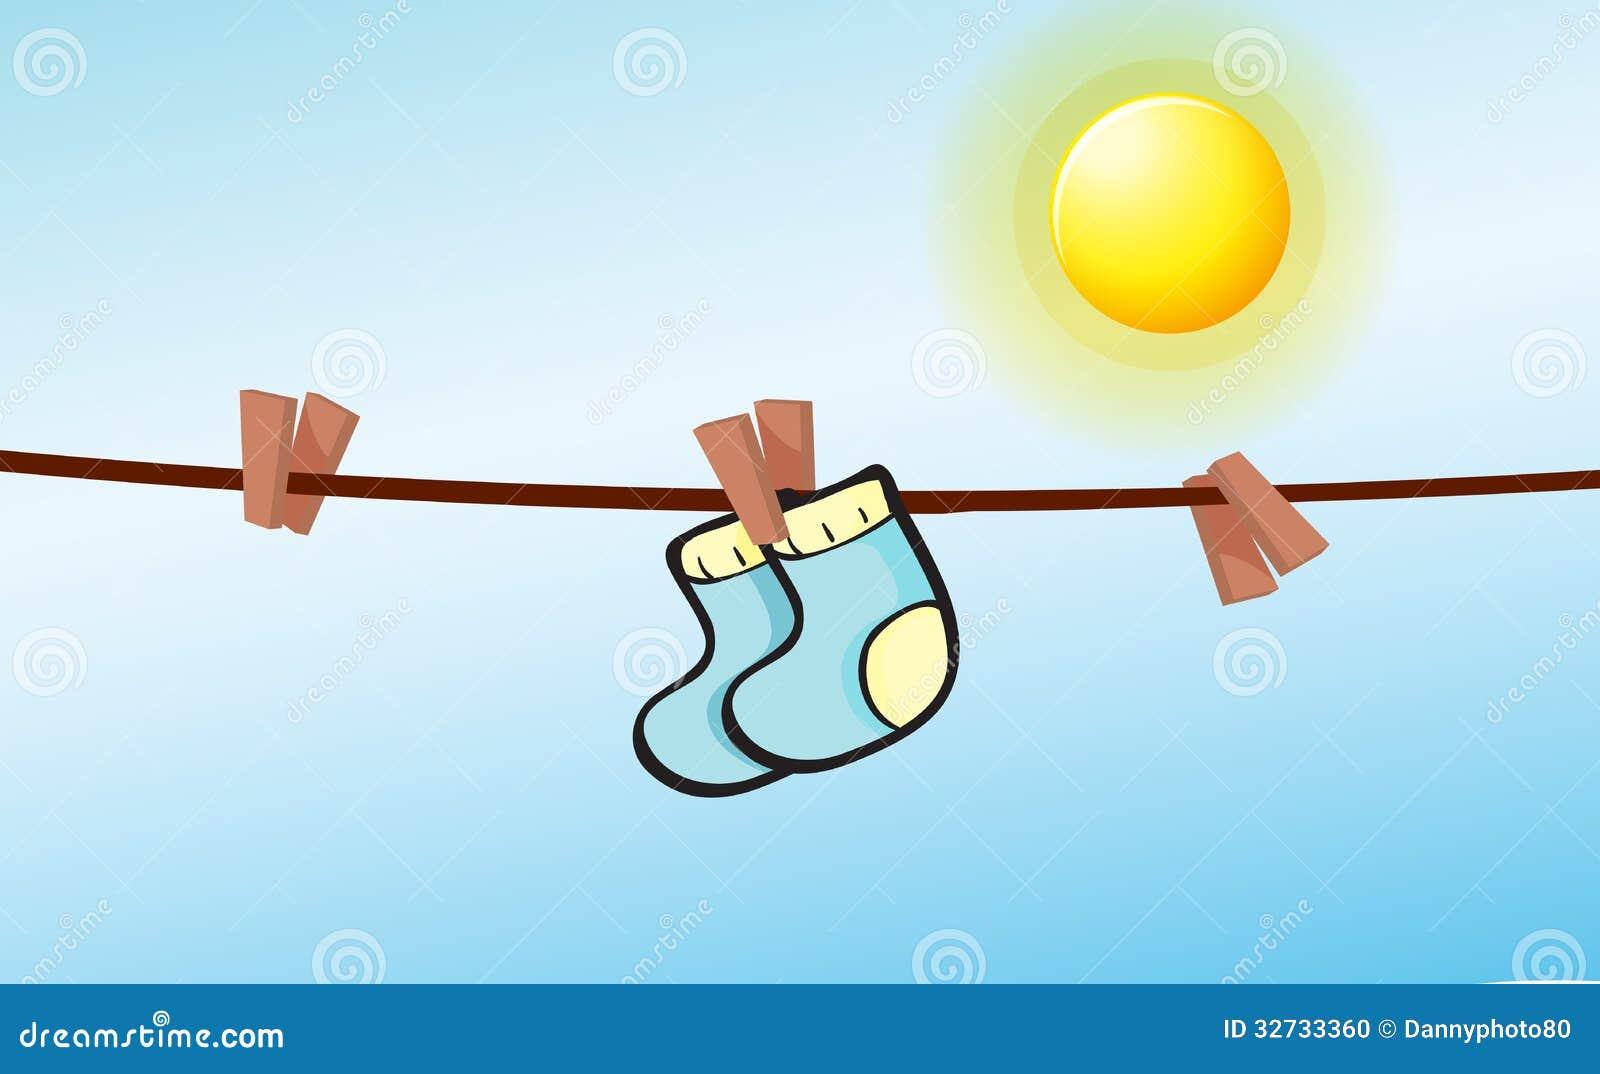 Clips Hanging Illustration